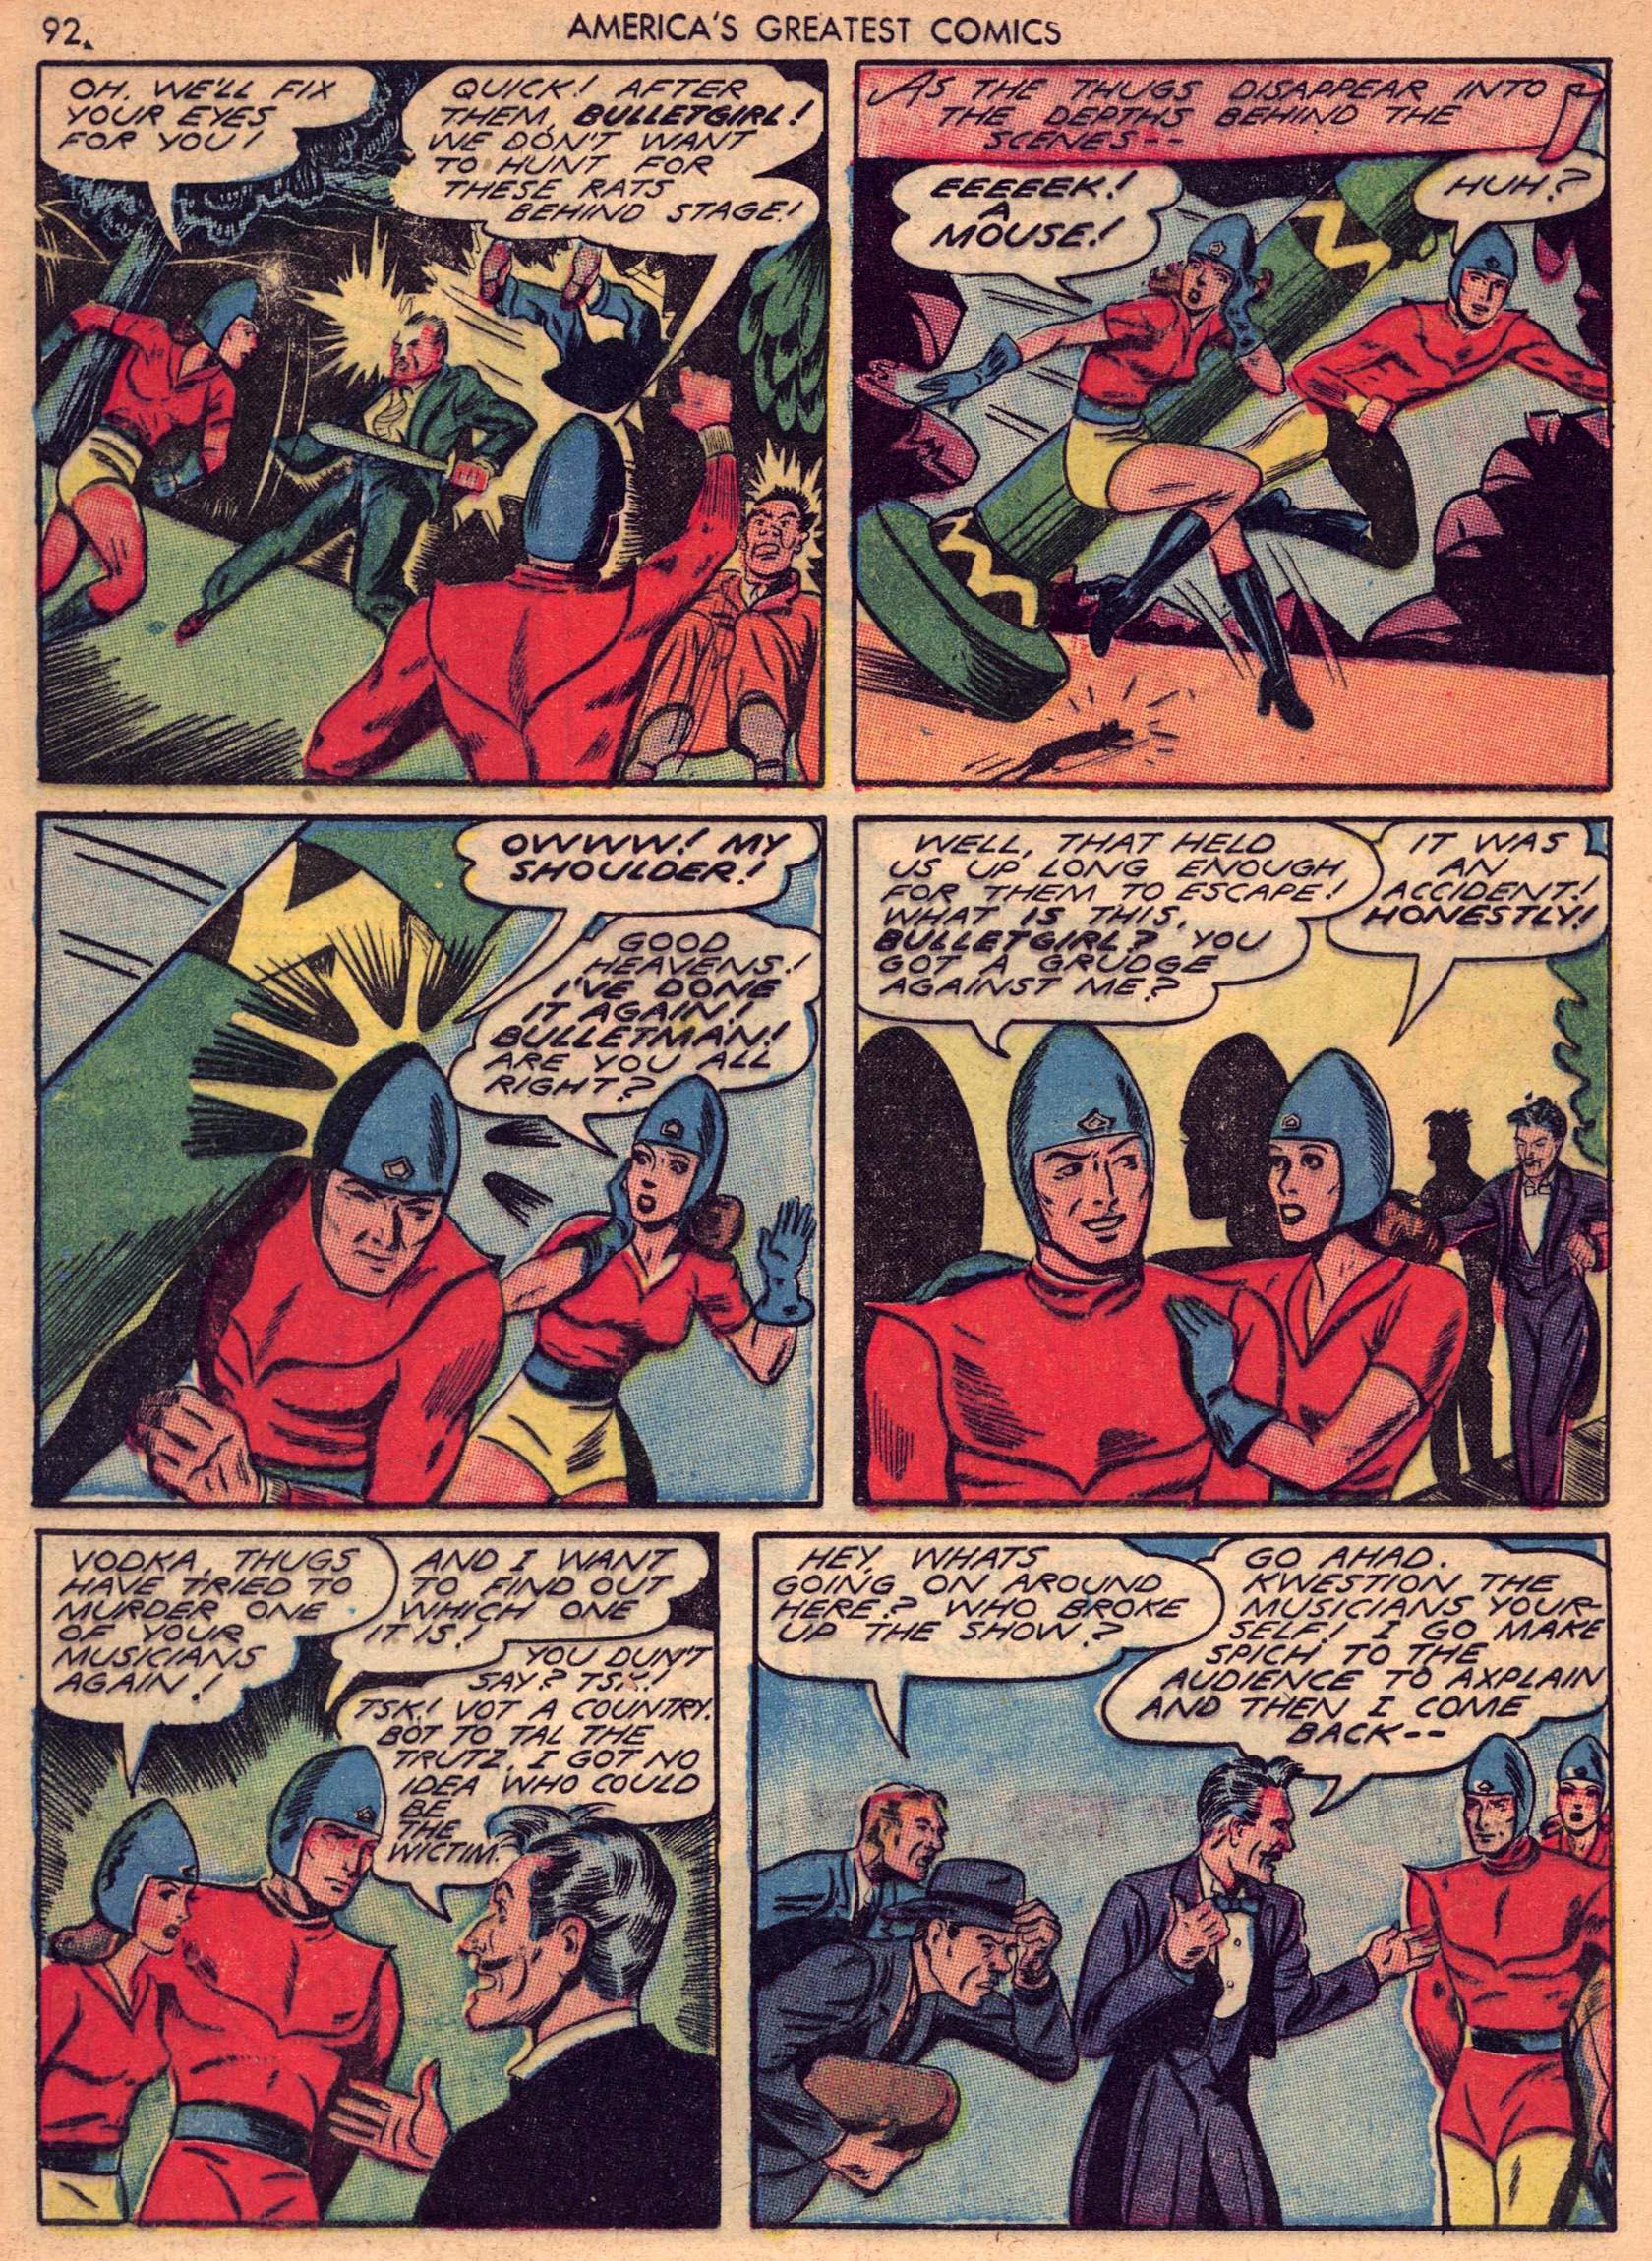 Read online America's Greatest Comics comic -  Issue #7 - 91